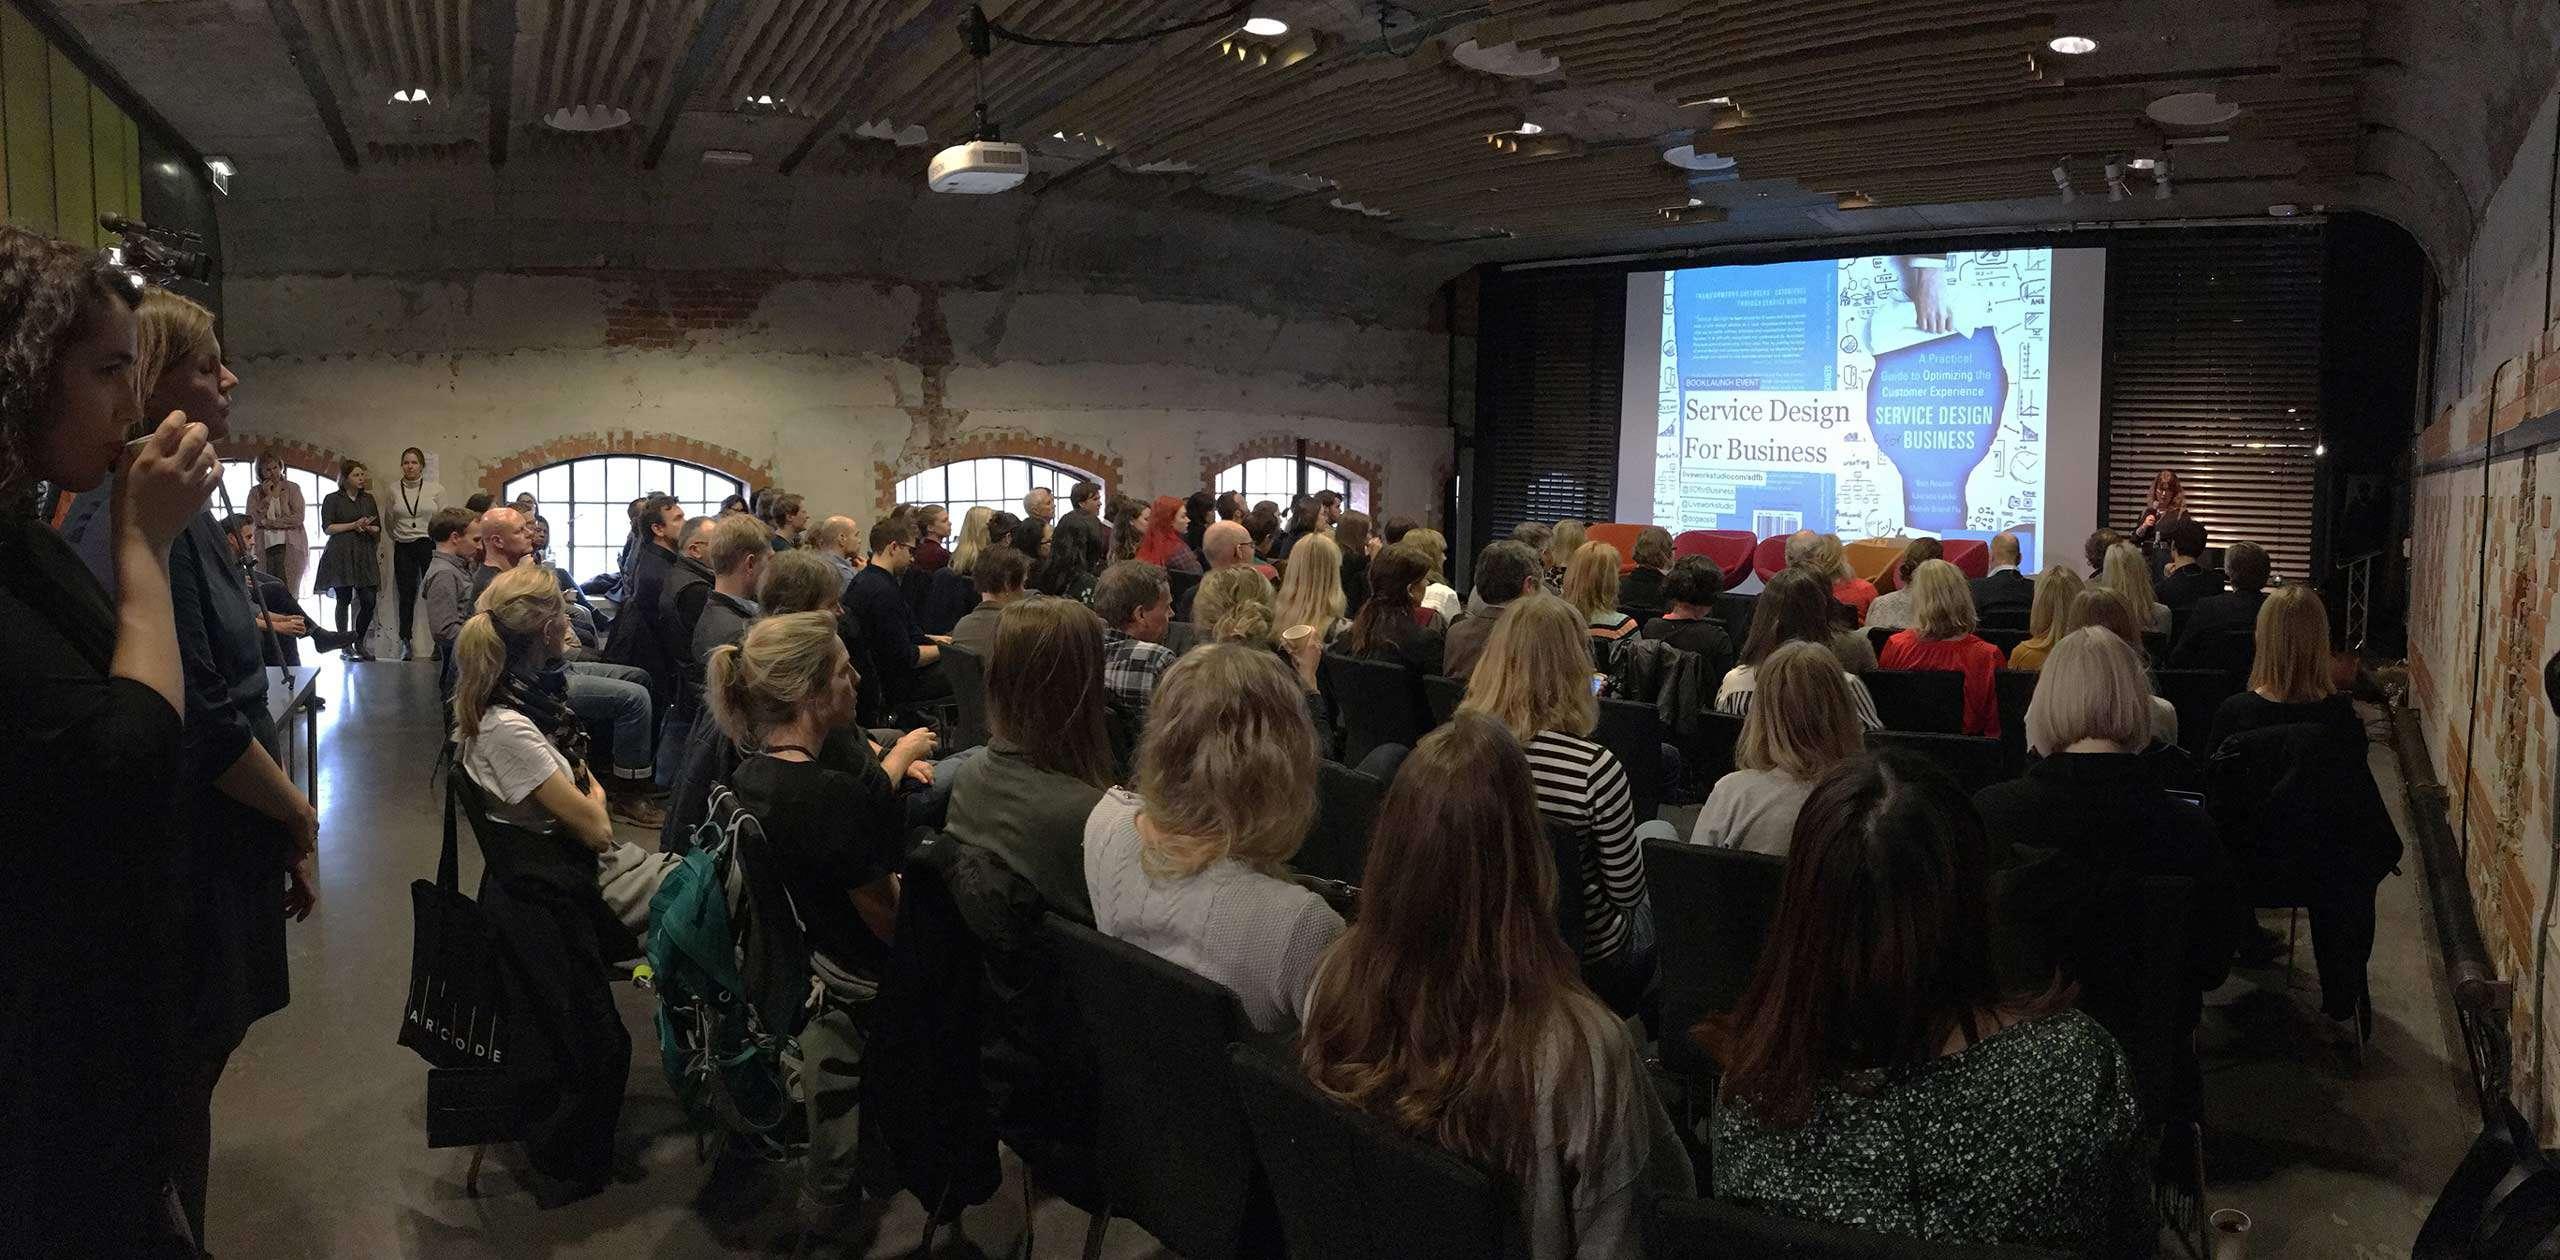 Service Design for Business book launch, Oslo